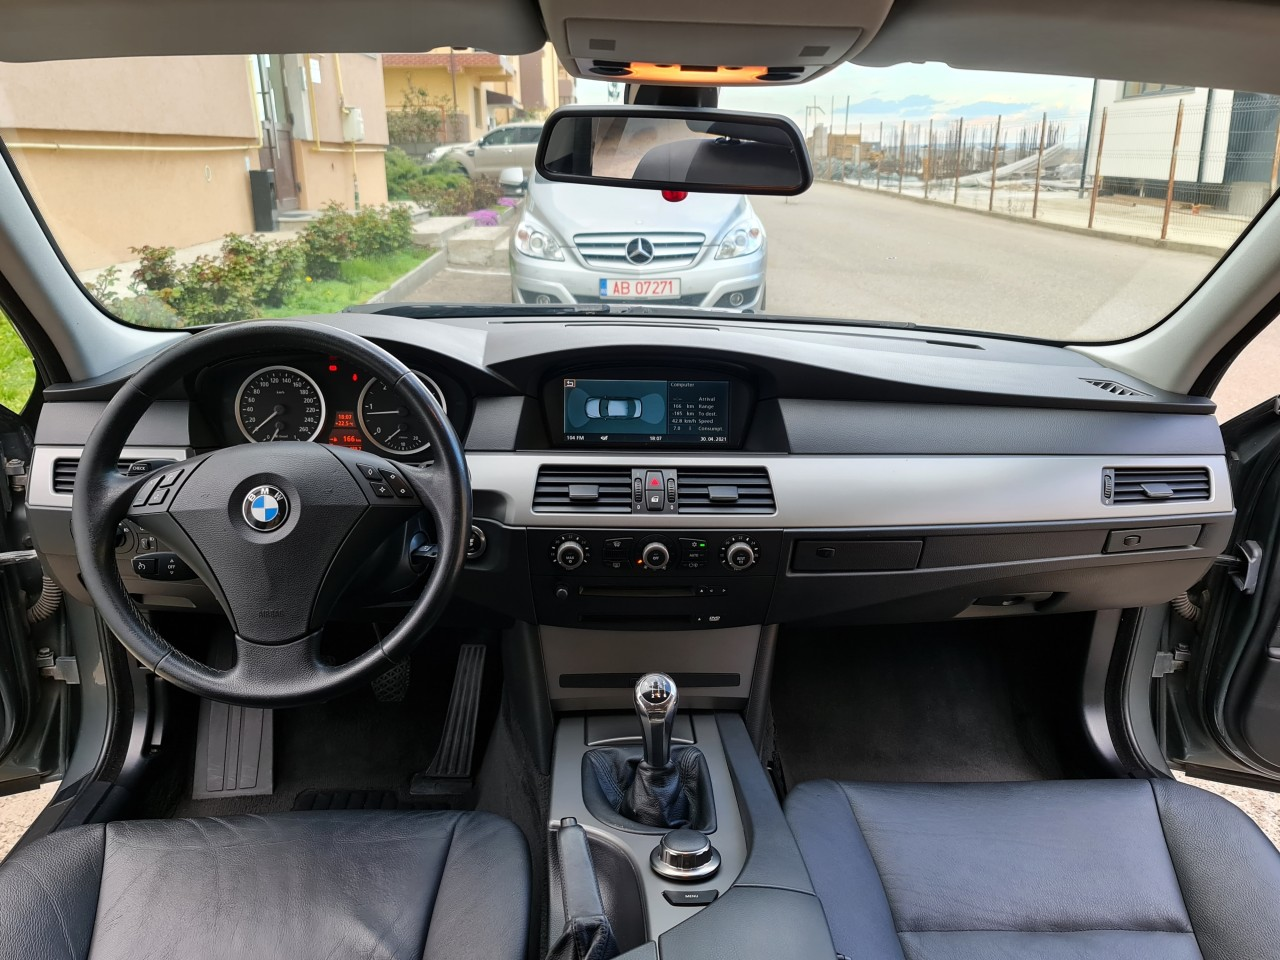 BMW 520 impecabil / 2.0 TDI 150 cp unic proprietar an fab. 2006